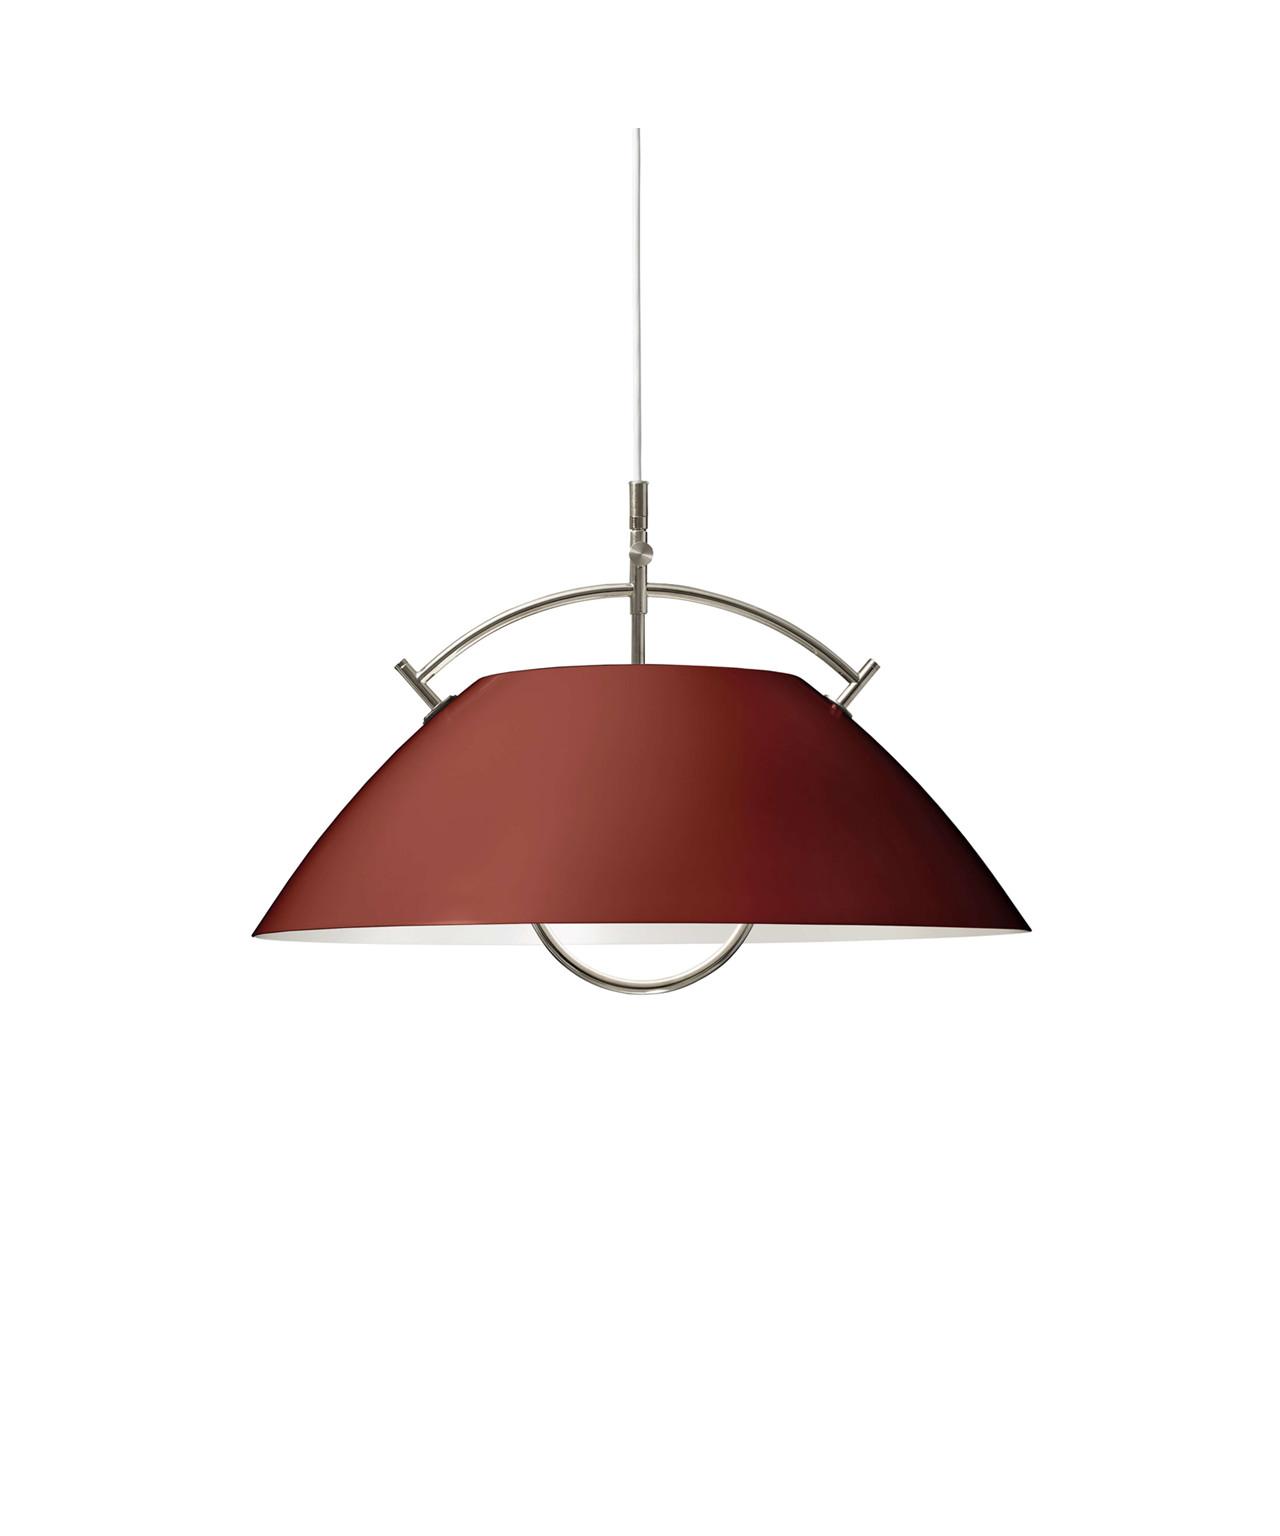 Afholte Hans J. Wegner ist für die Pendant & Opala Lampen bekannt RP-48